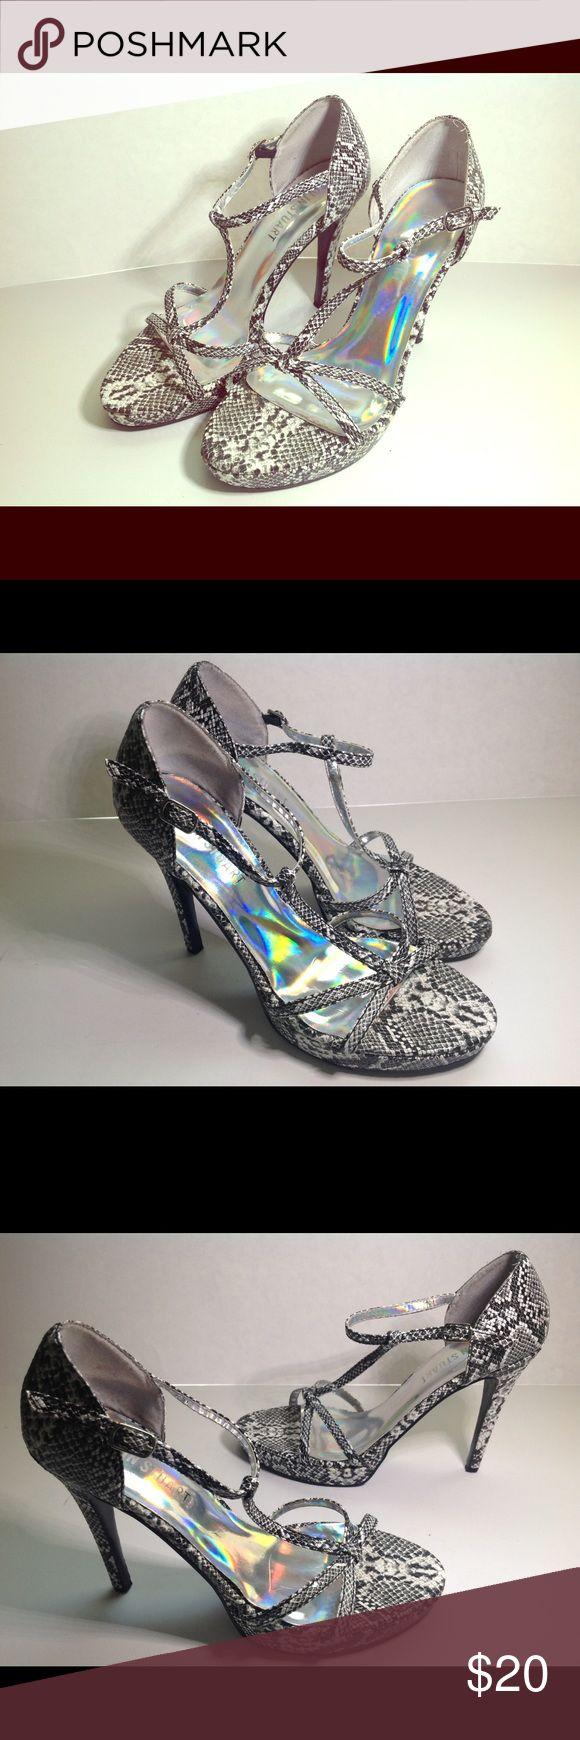 Size 7.5 COLIN STUART Black White Strappy Sandals Black and white heeled sandals. Ankle strap closure. Excellent condition. Colin Stuart Shoes Sandals